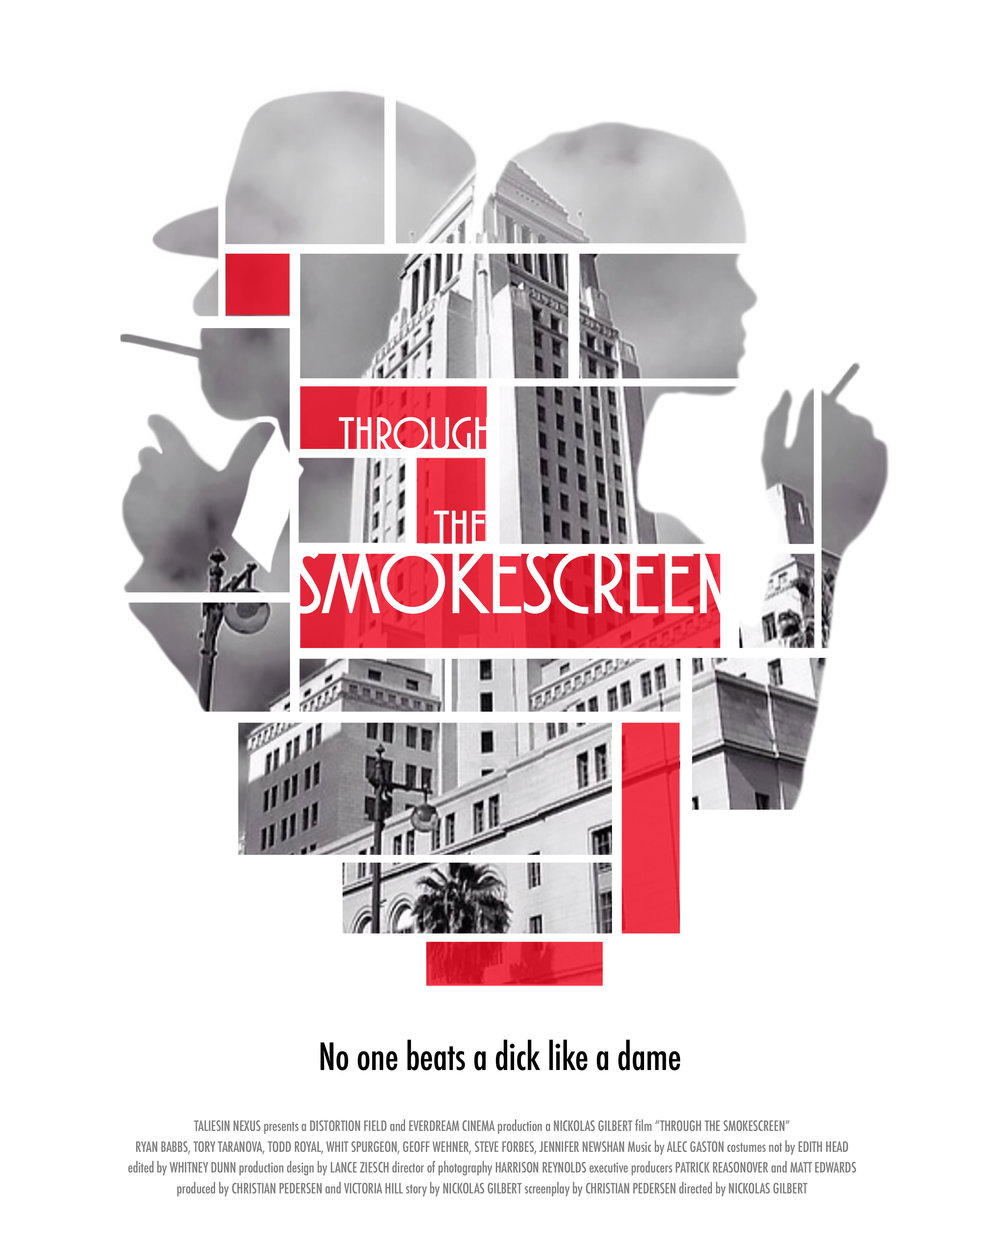 smokescreen_poster_tagline_credits.jpg